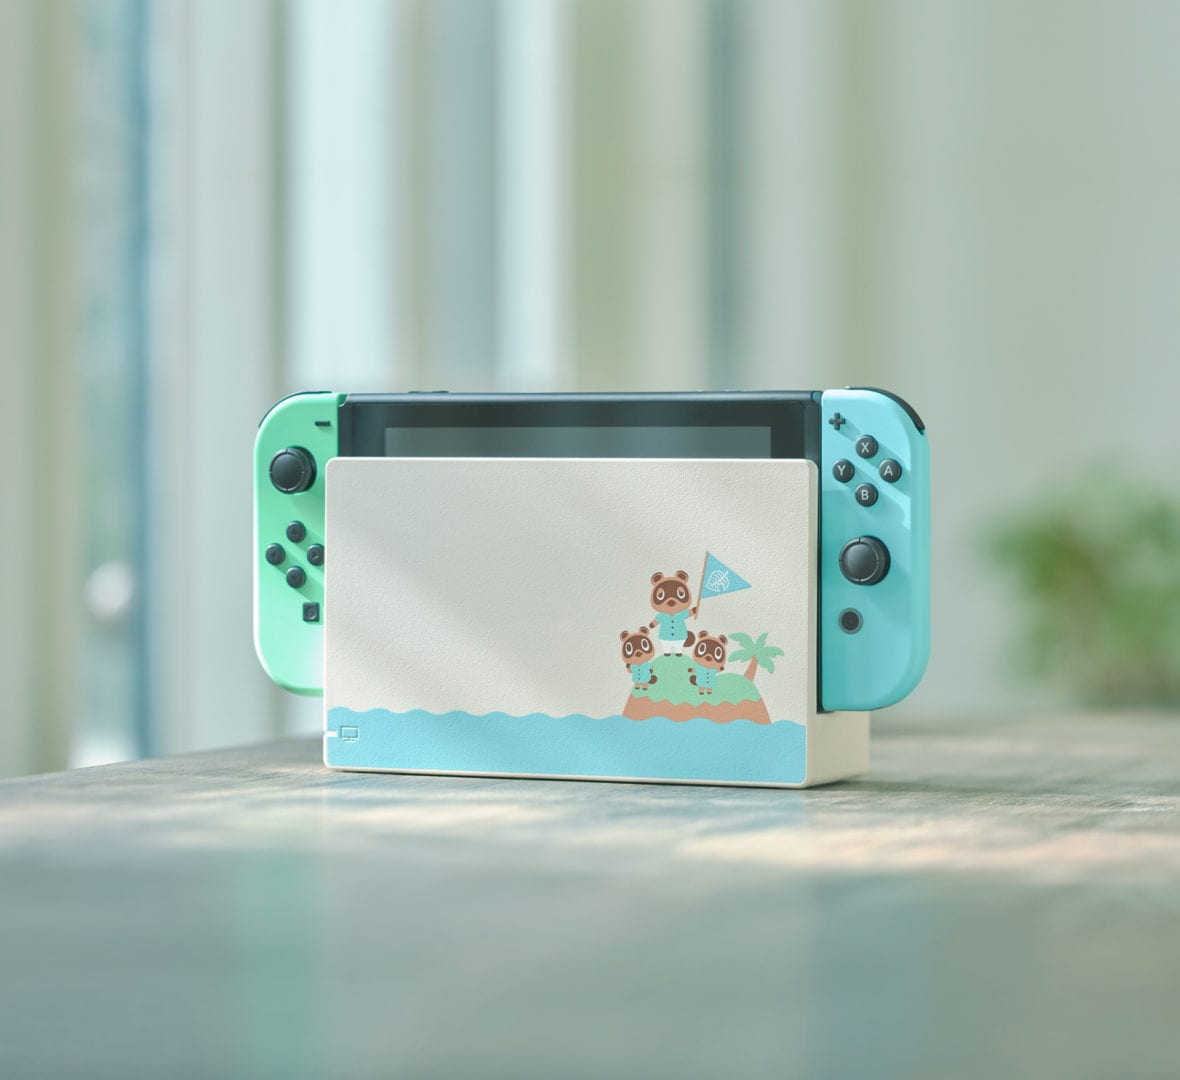 animal crossing nintendo switch edition